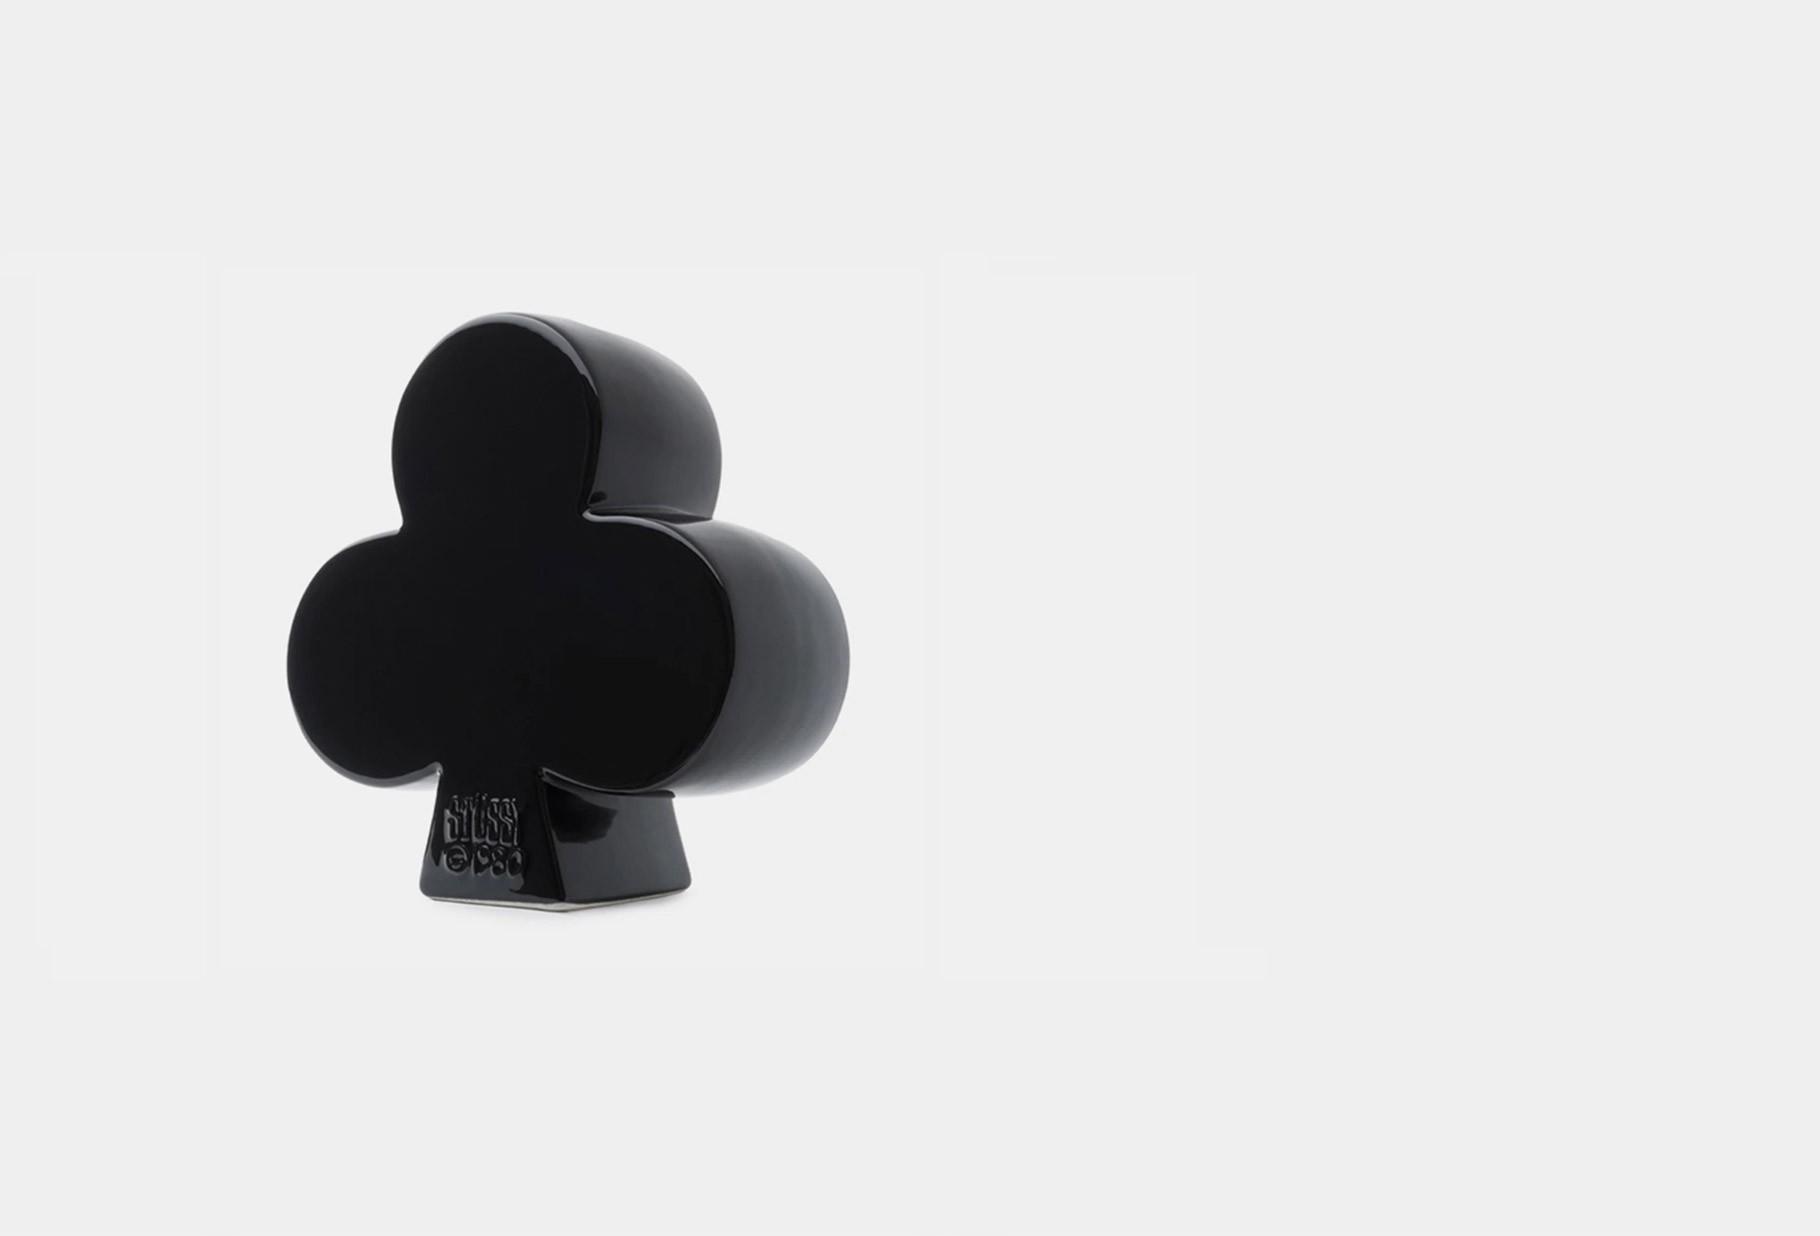 STUSSY / Club vase Black